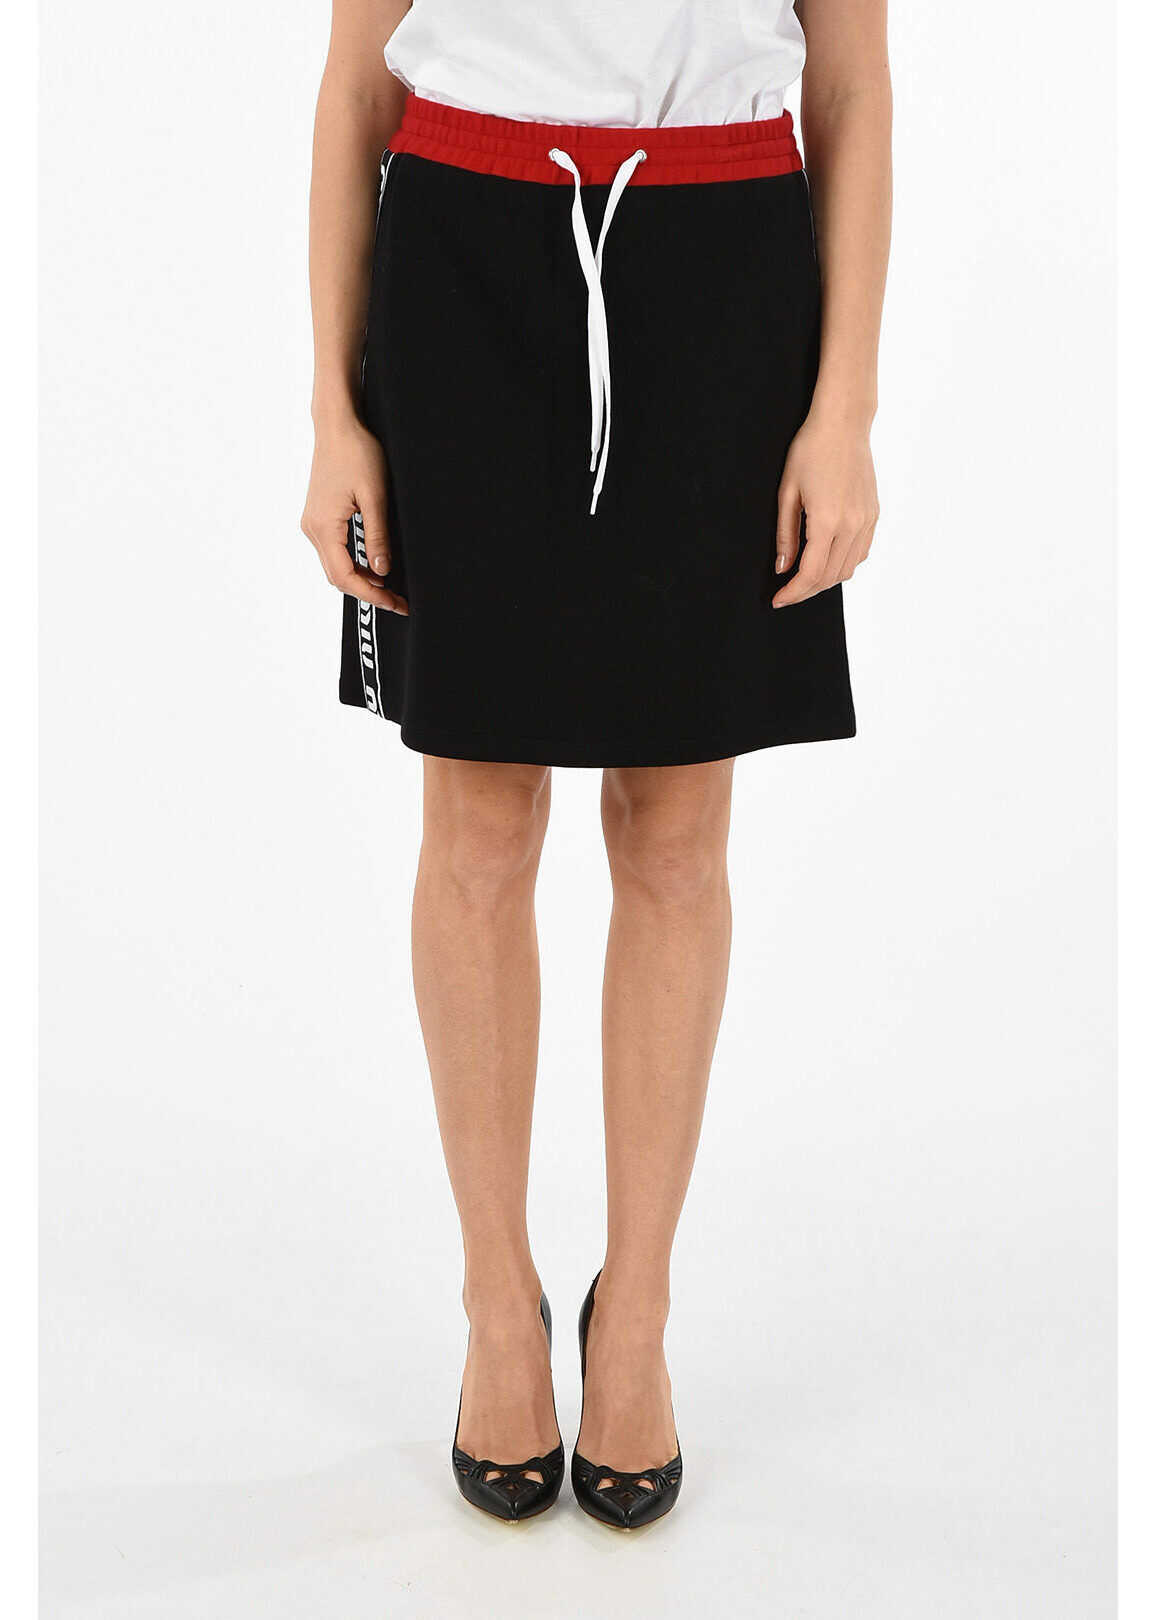 Miu Miu Nylon and cotton Mini Skirt BLACK